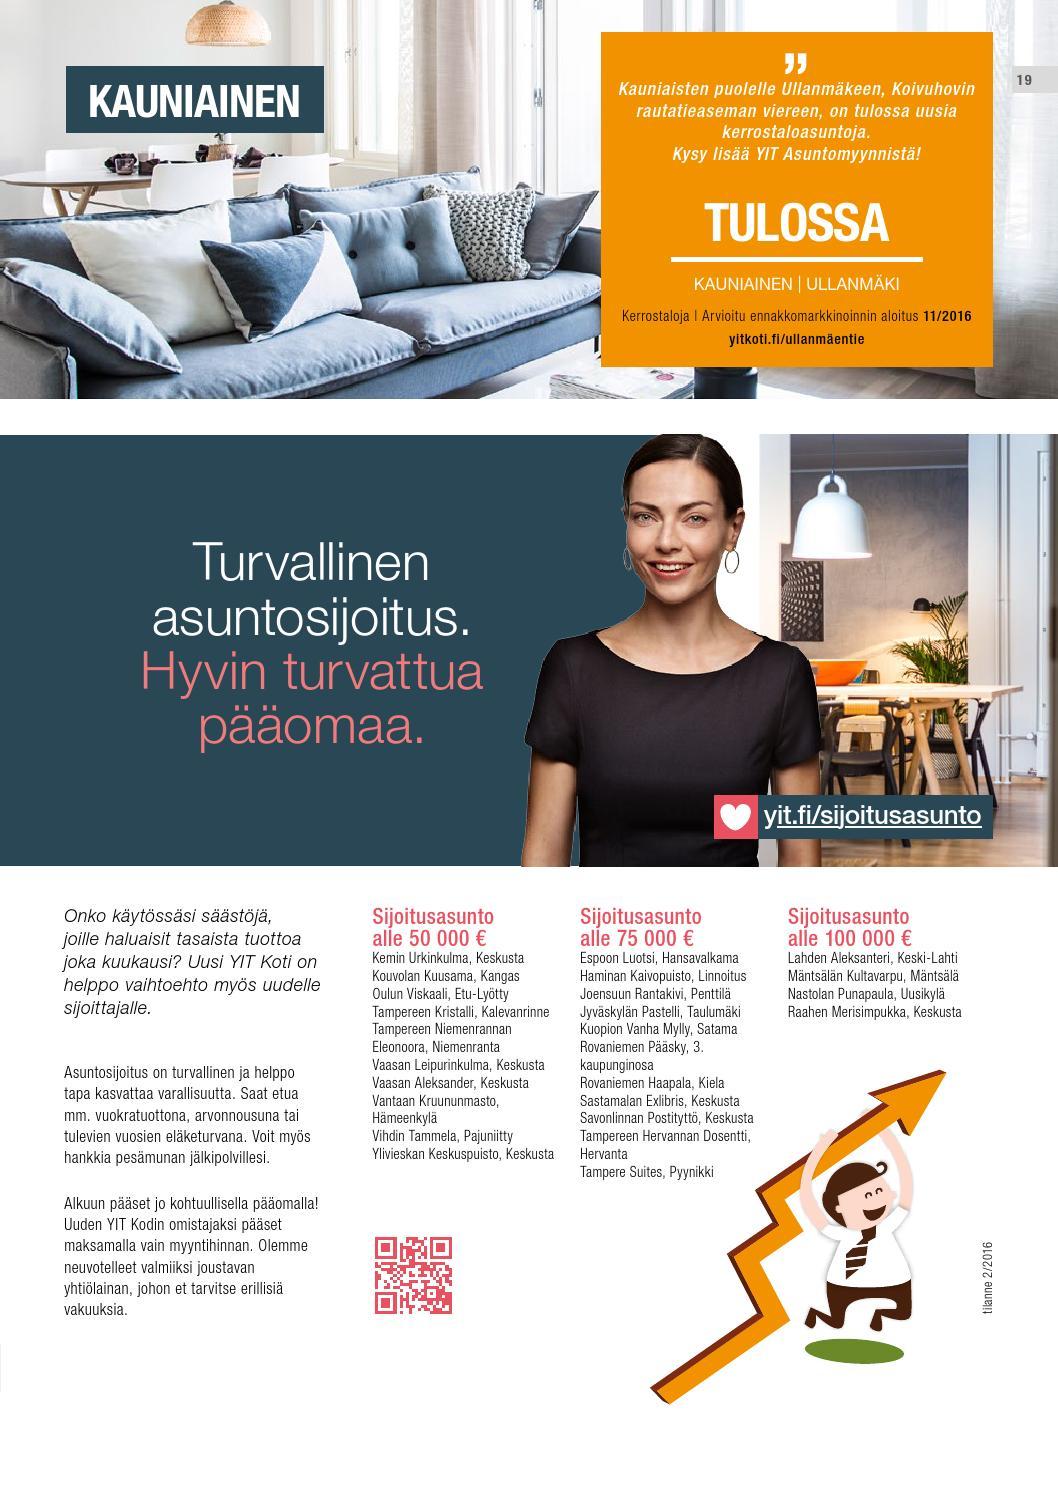 Tietokoneen Korjaus Tampere